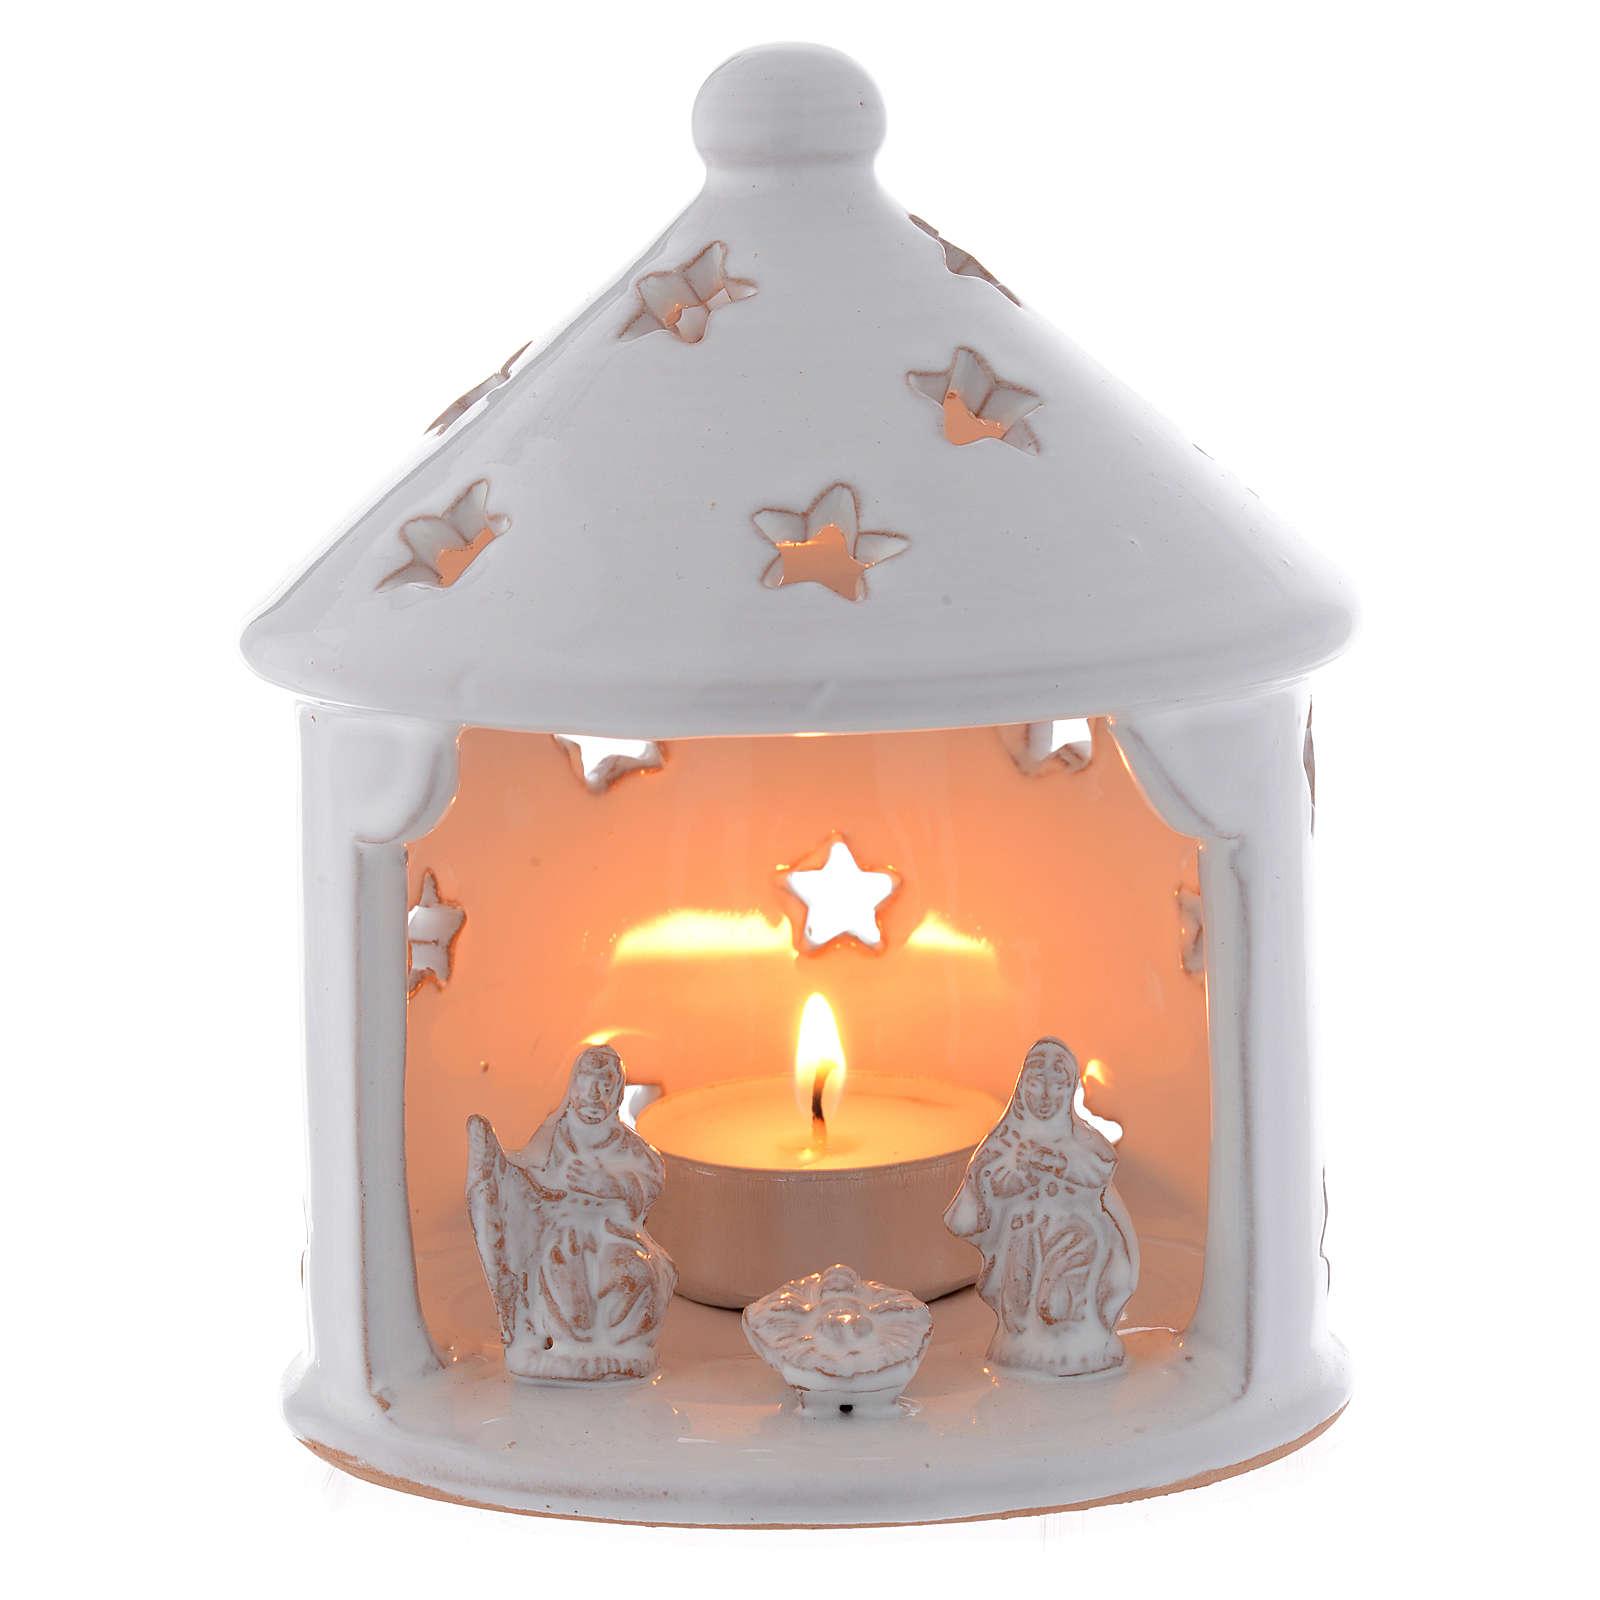 Capanna lume bianca traforata di Natale terracotta 13 cm 4